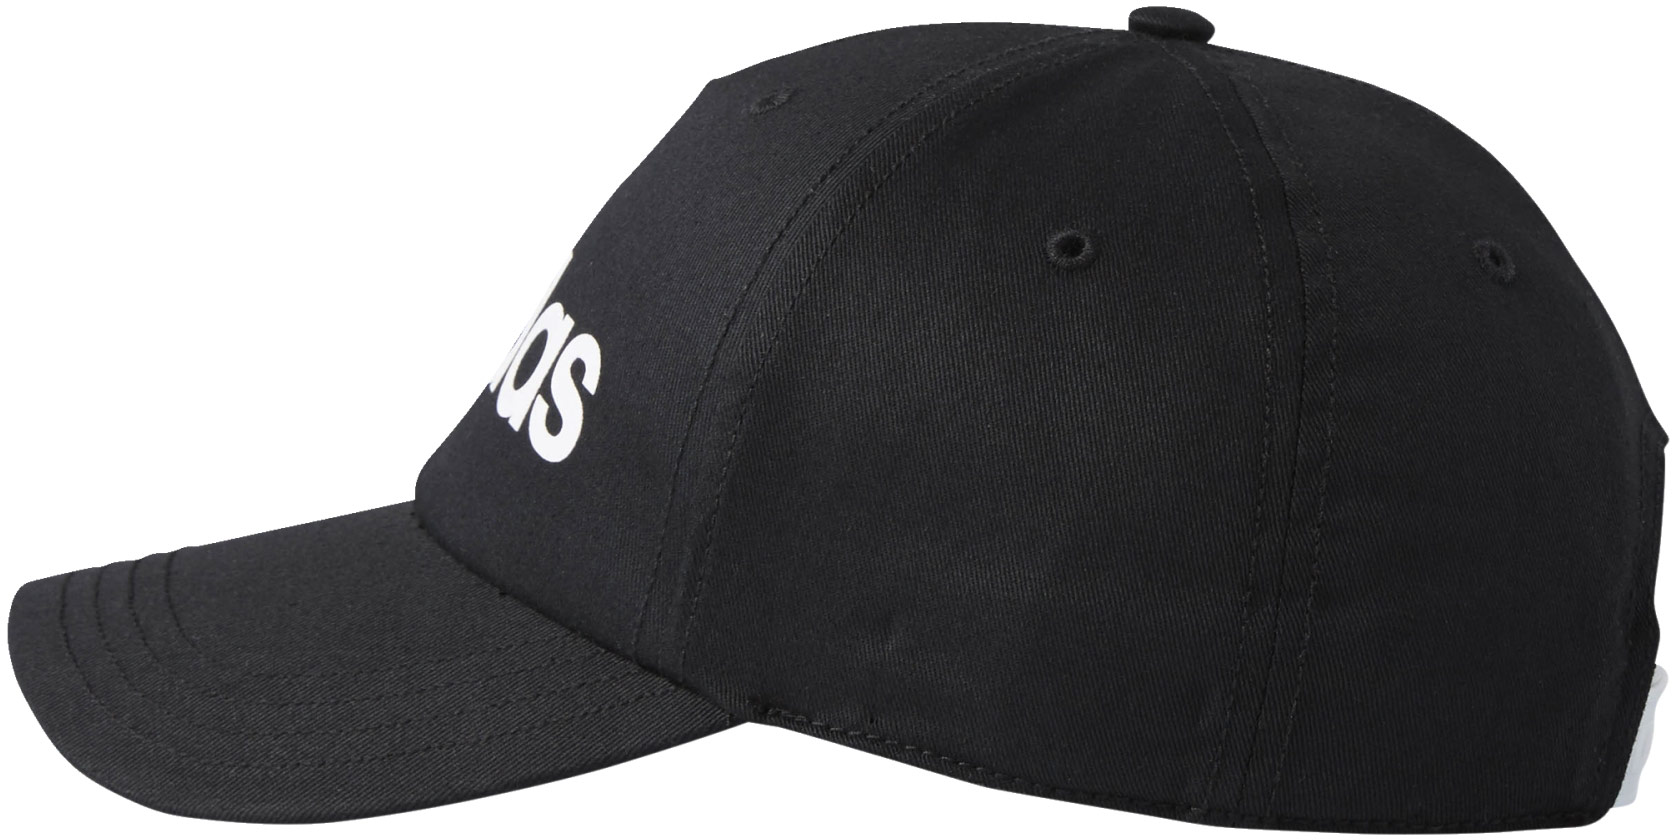 32fd0144794 adidas NEO DAILY CAP